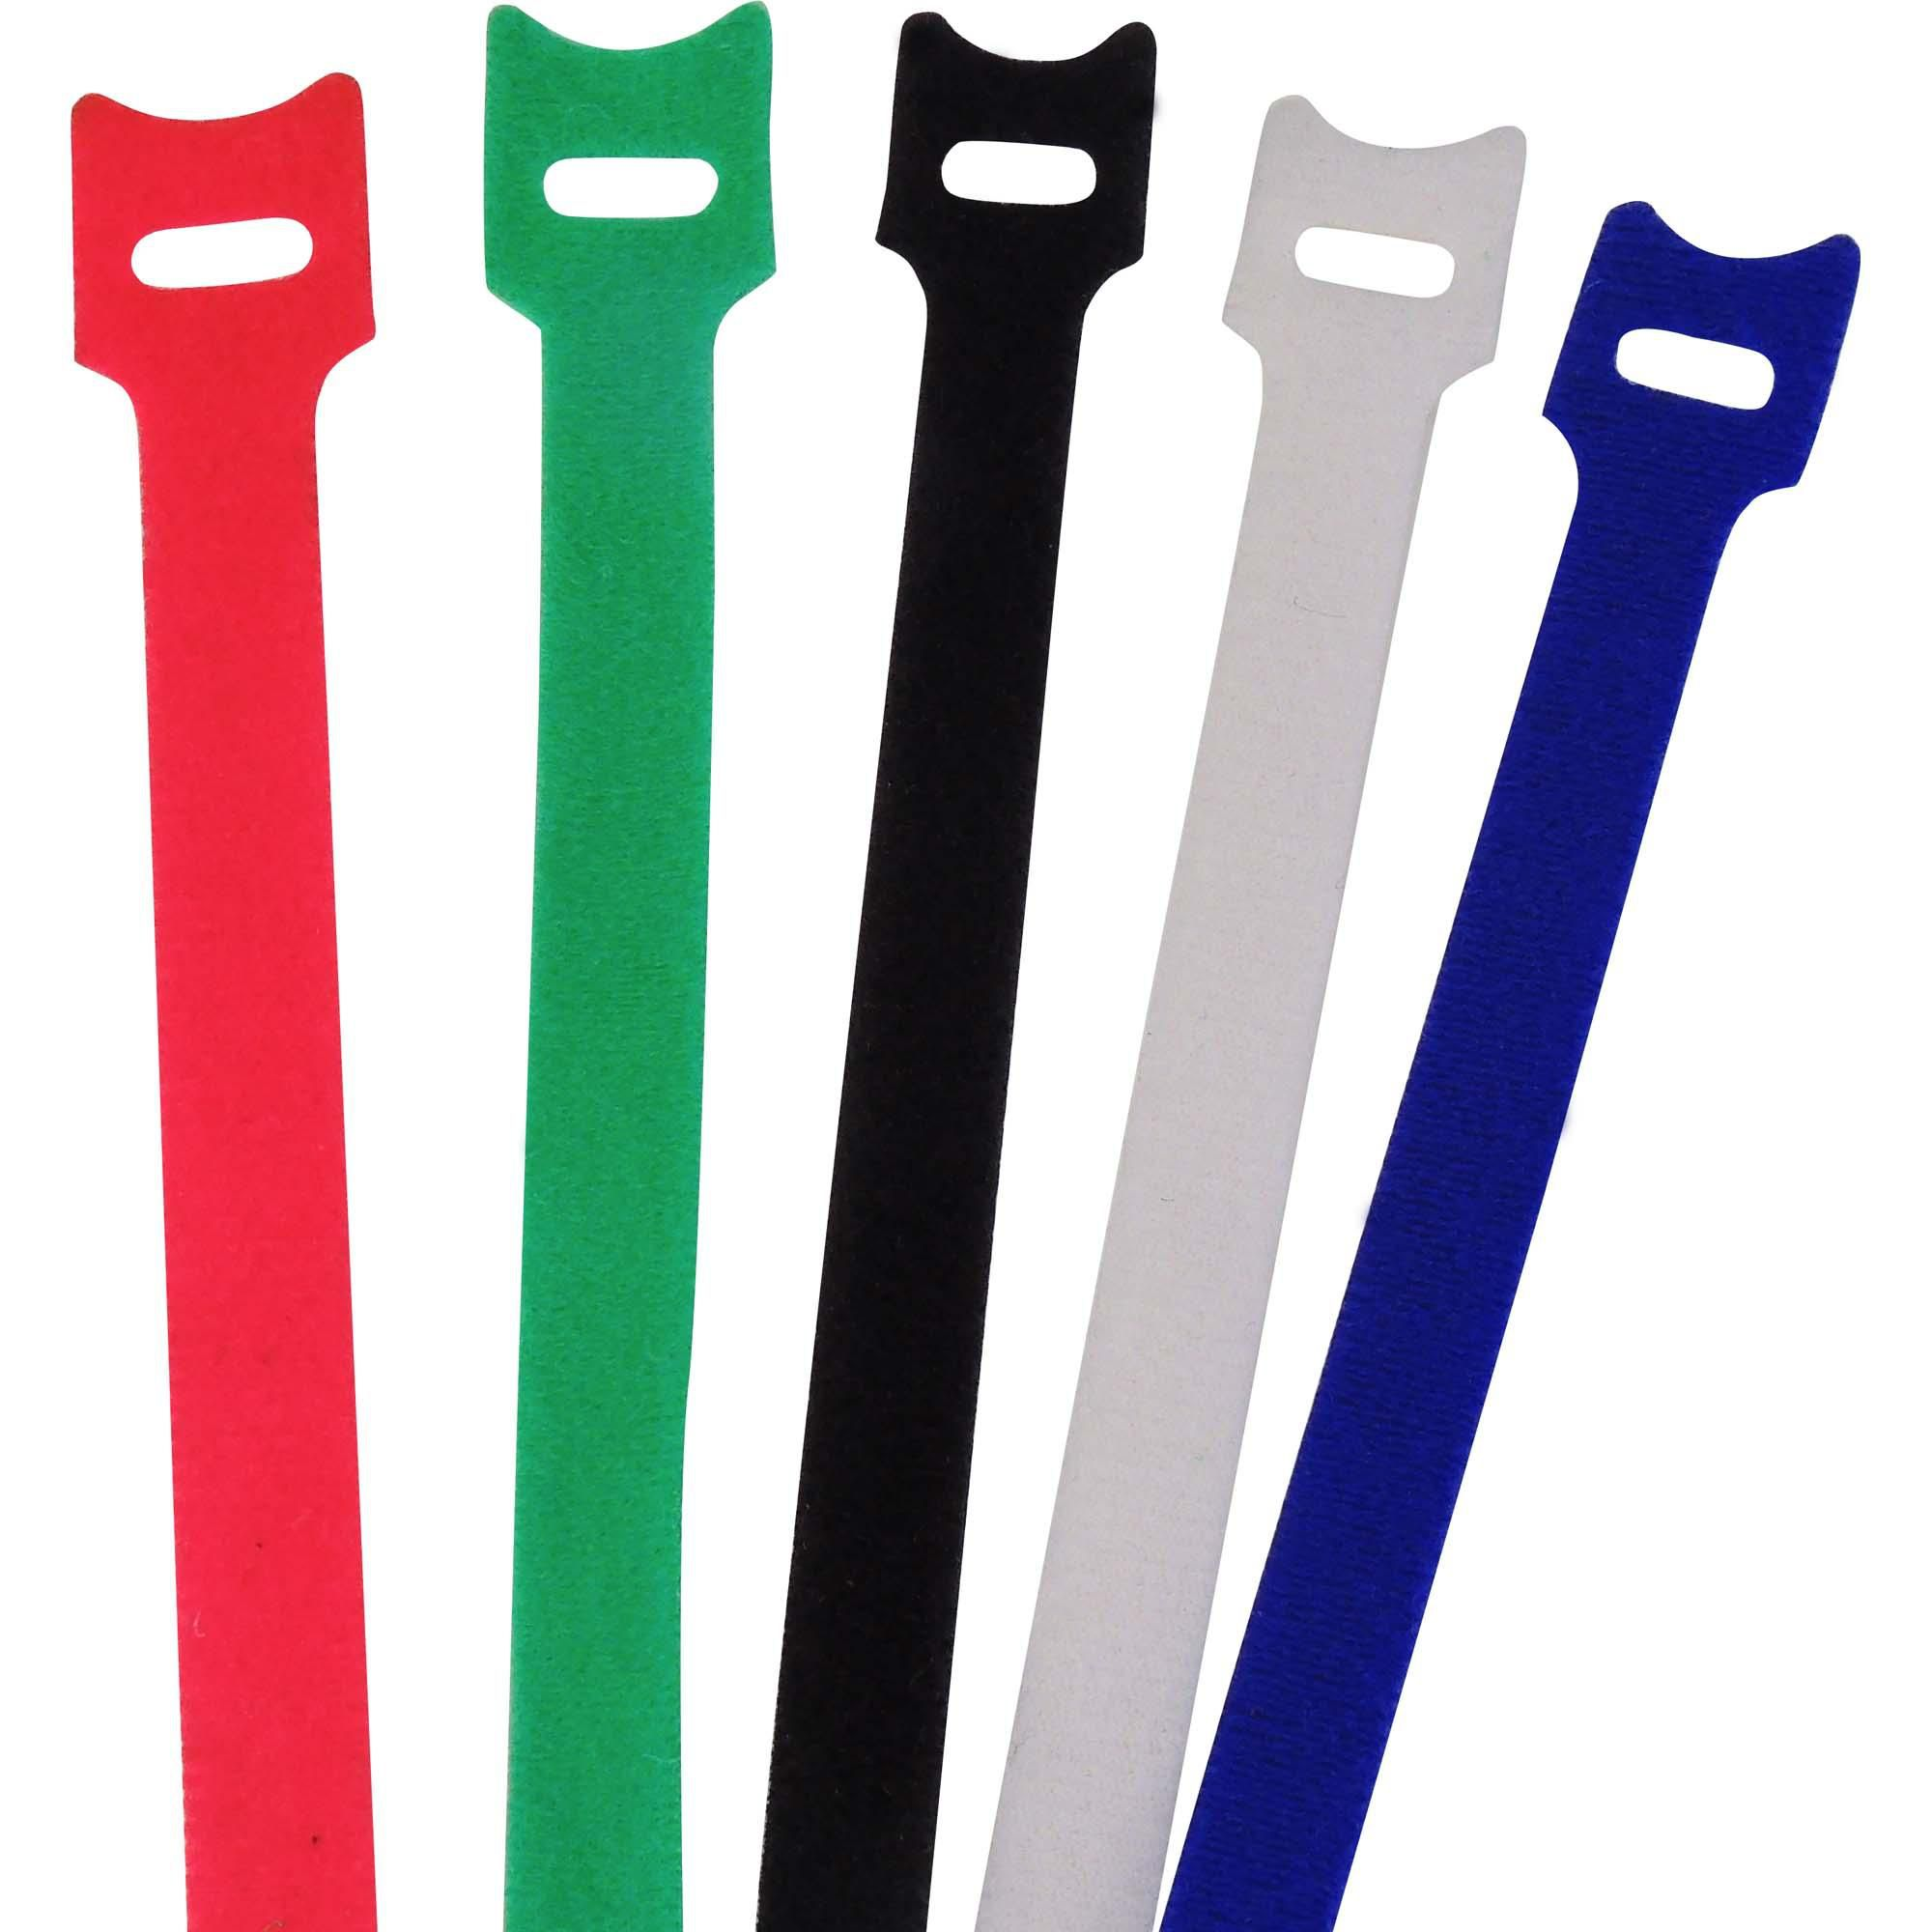 Abraçadeira Autofixável Color 12mmx150mm C/ 5un